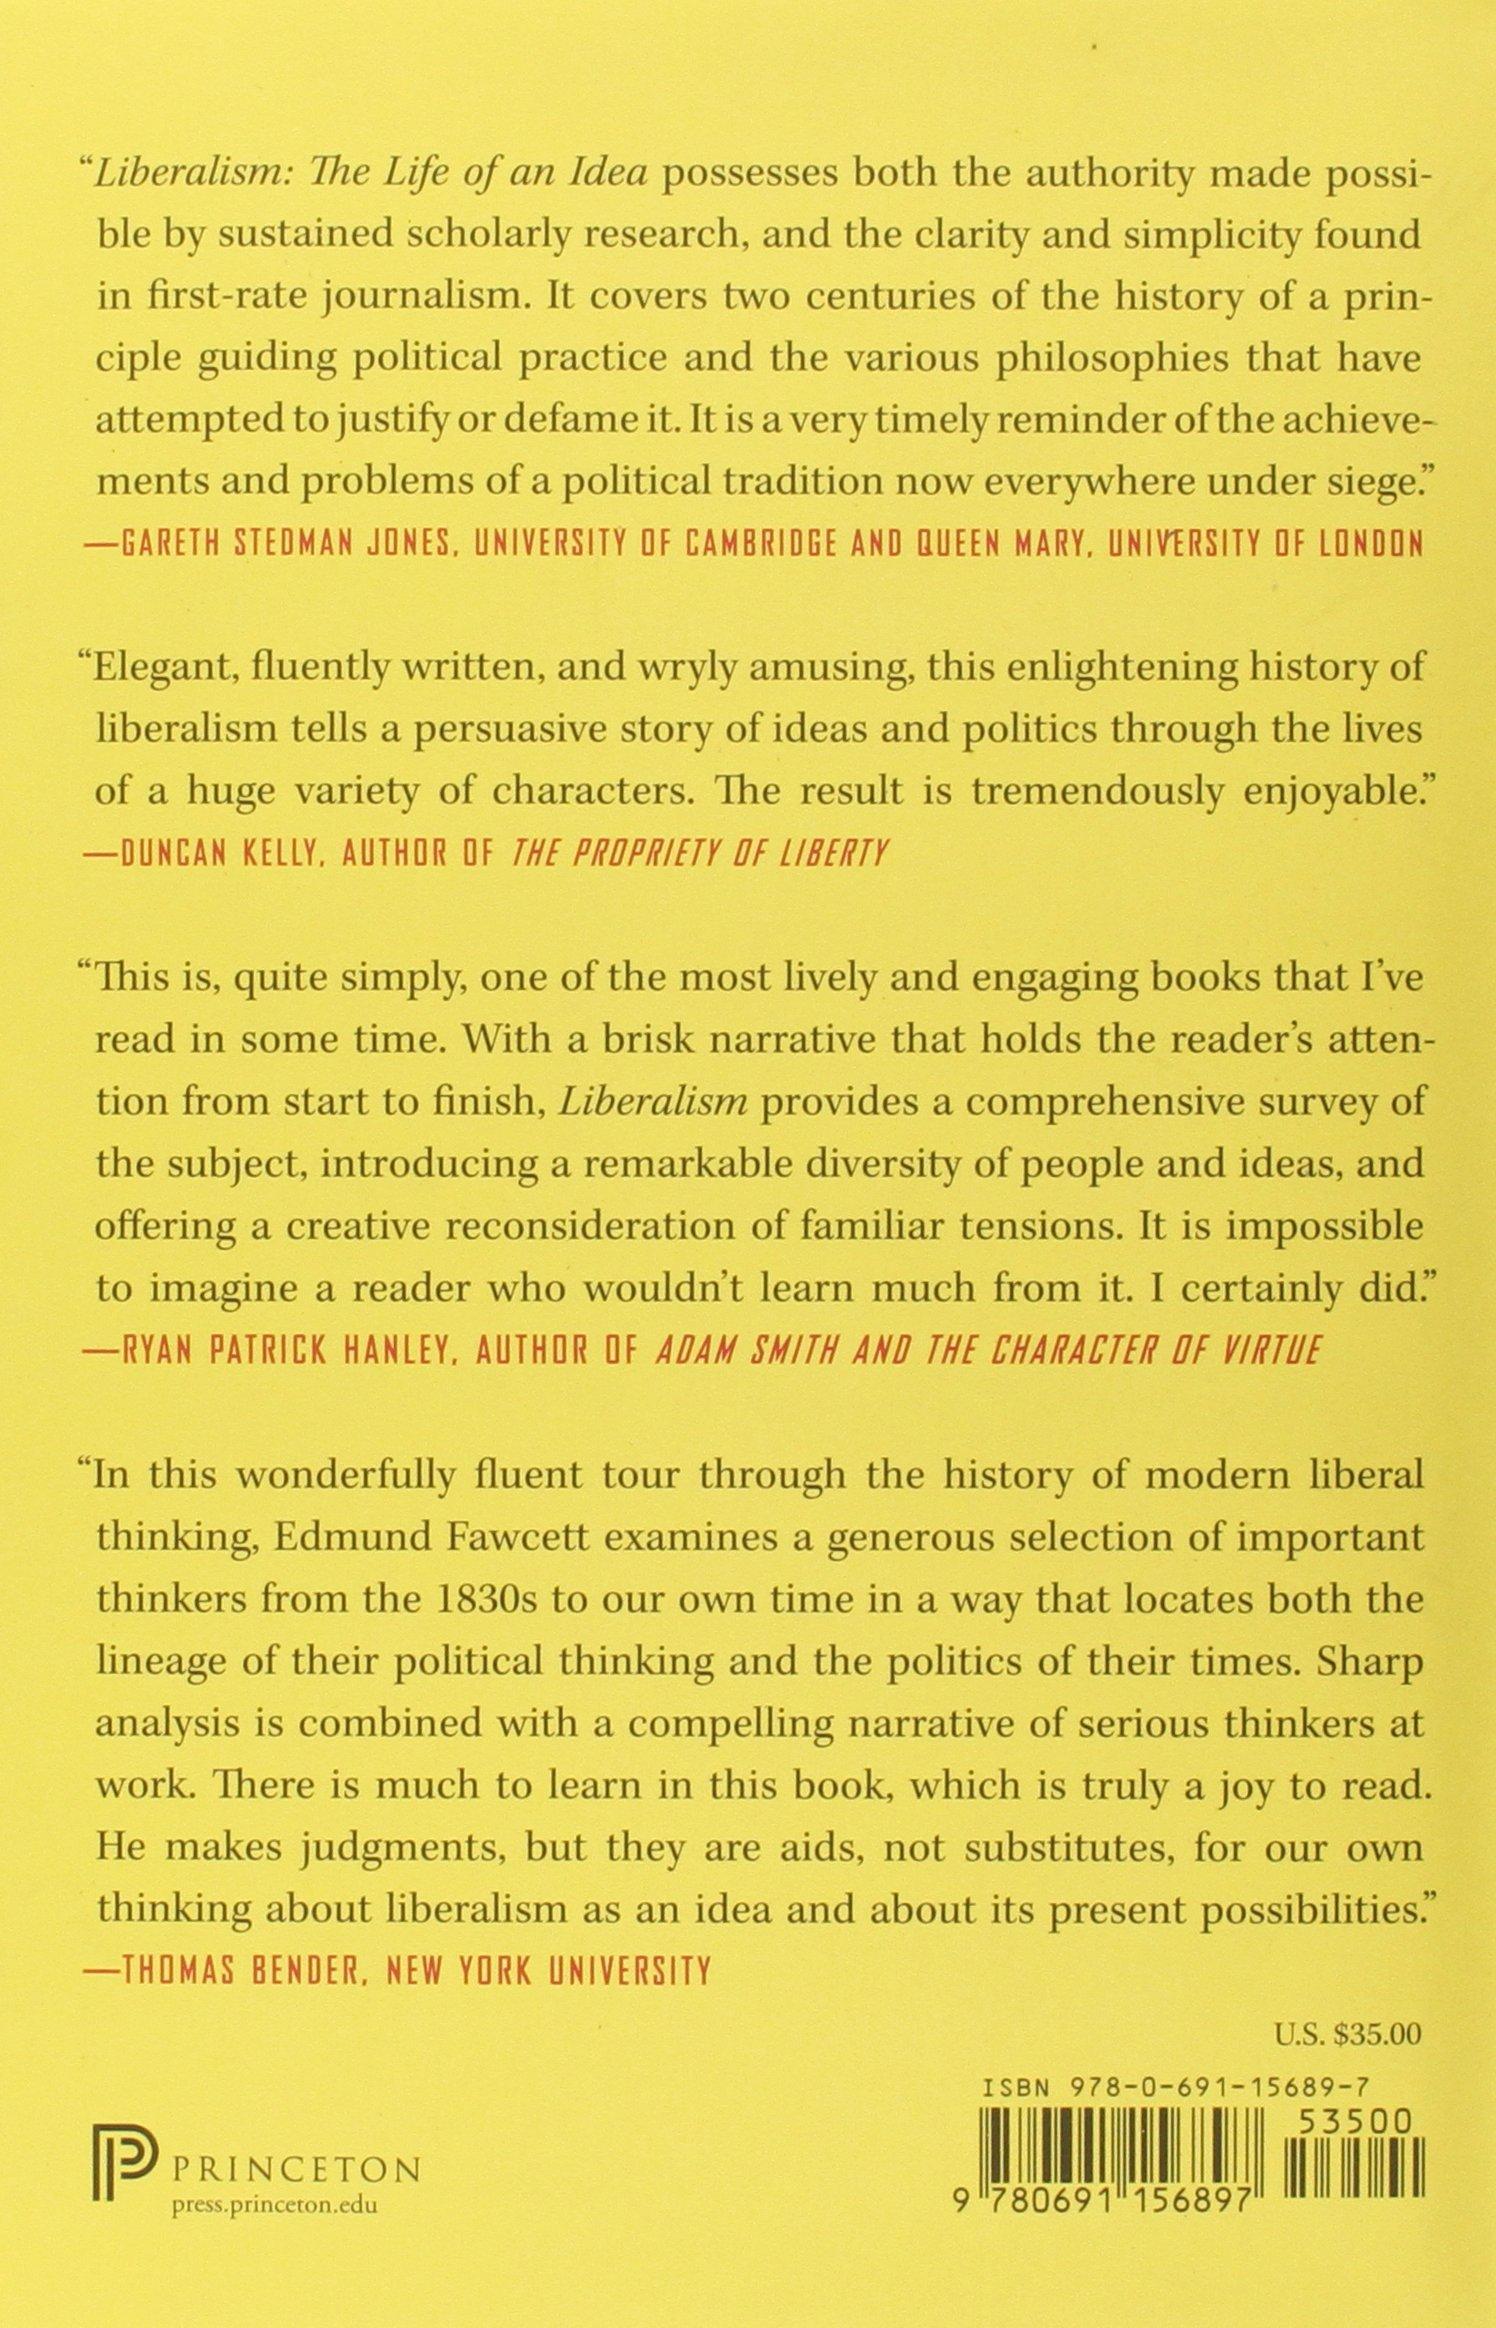 Liberalism: The Life Of An Idea: Edmund Fawcett: 9780691156897: Amazon:  Books